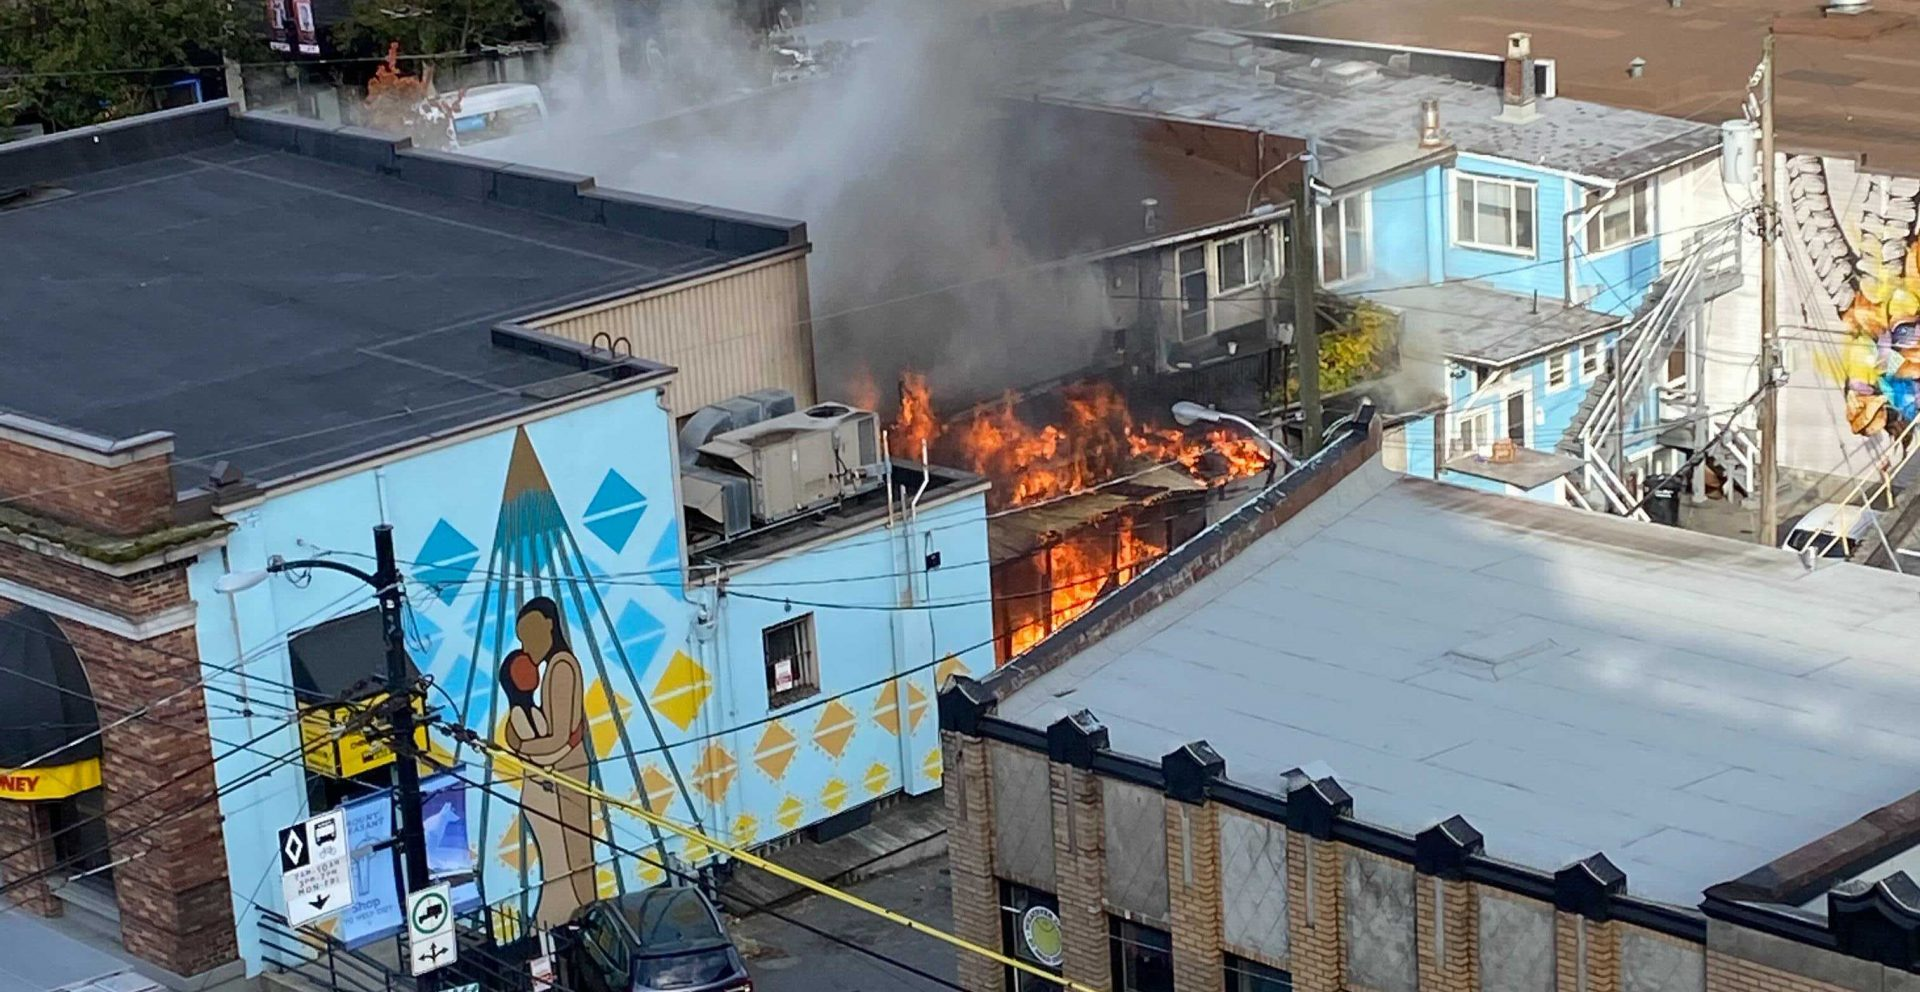 Vancouver fire crews battling three-alarm blaze on Broadway and Main Street (VIDEO)